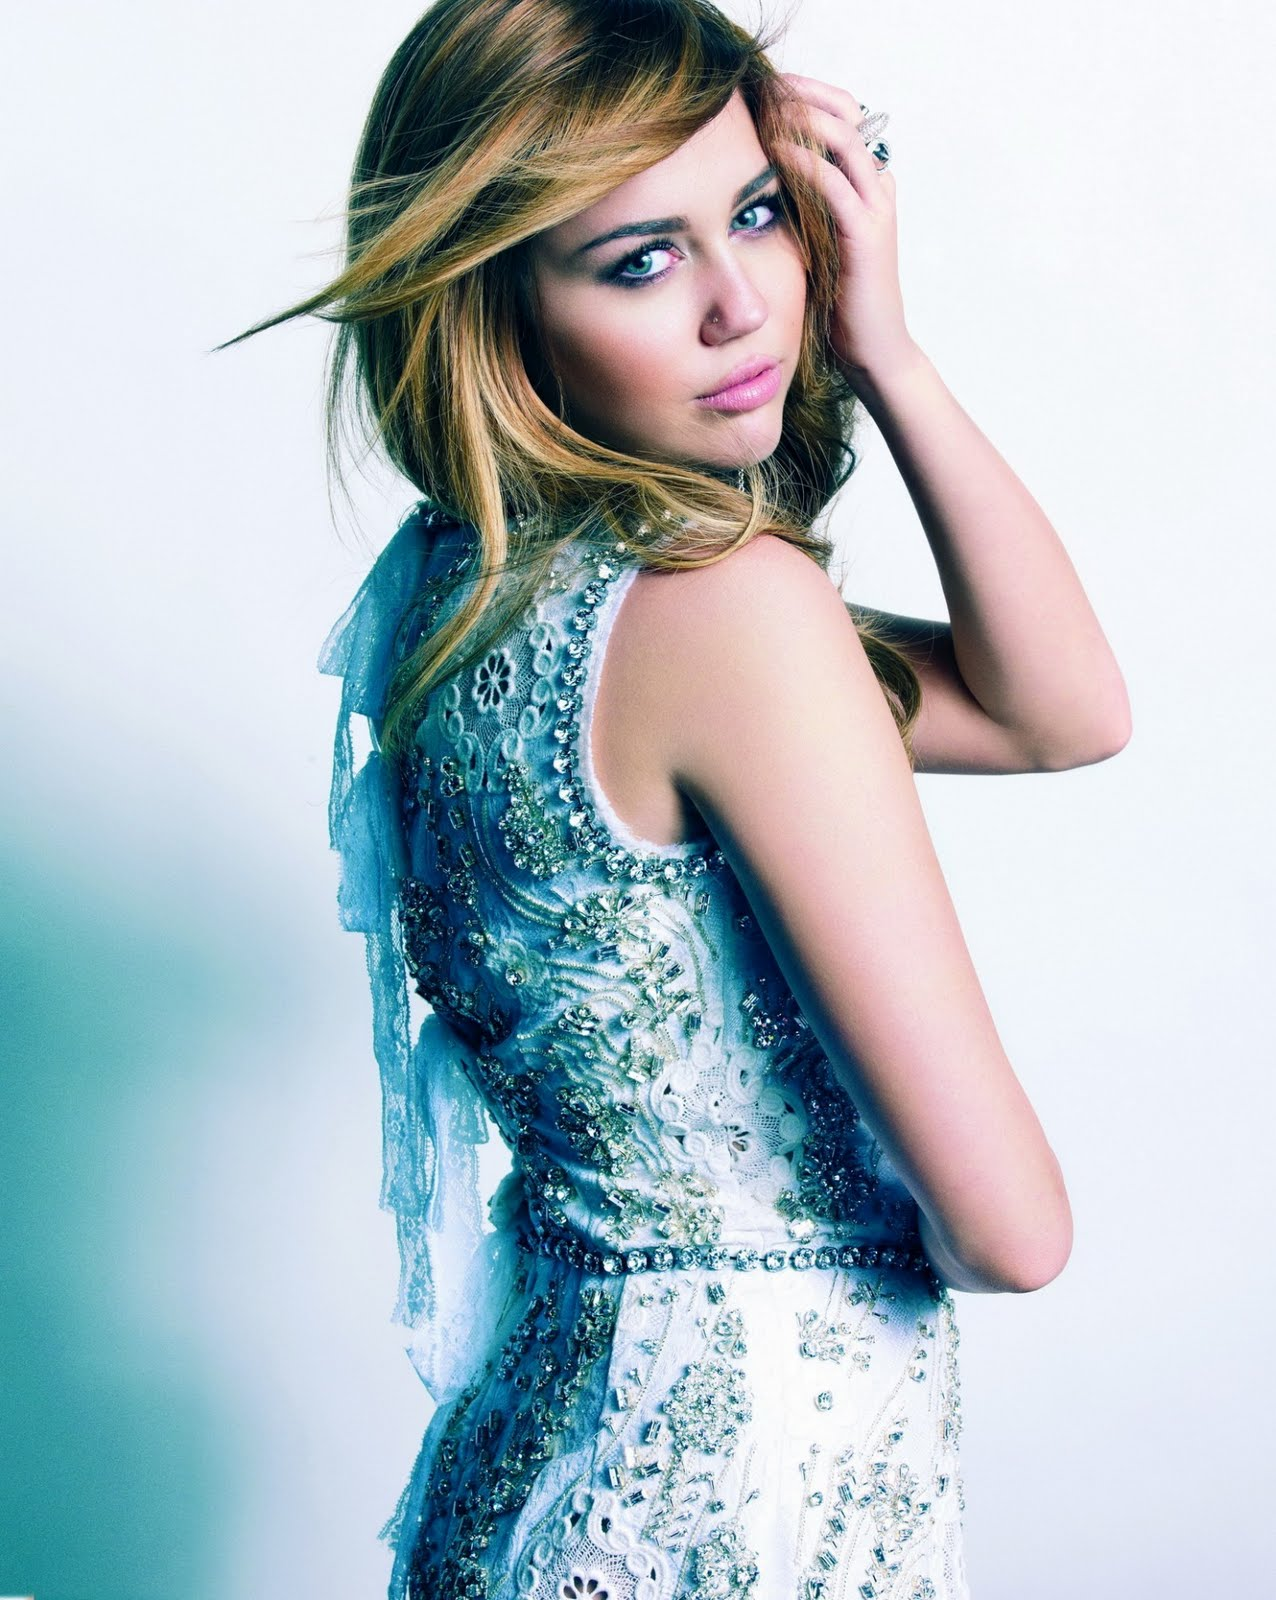 http://1.bp.blogspot.com/-iX7ymA3Pxv8/TWi8E-X3cWI/AAAAAAAAIAs/HlZp40fOqC4/s1600/Miley-Cyrus-36.jpg